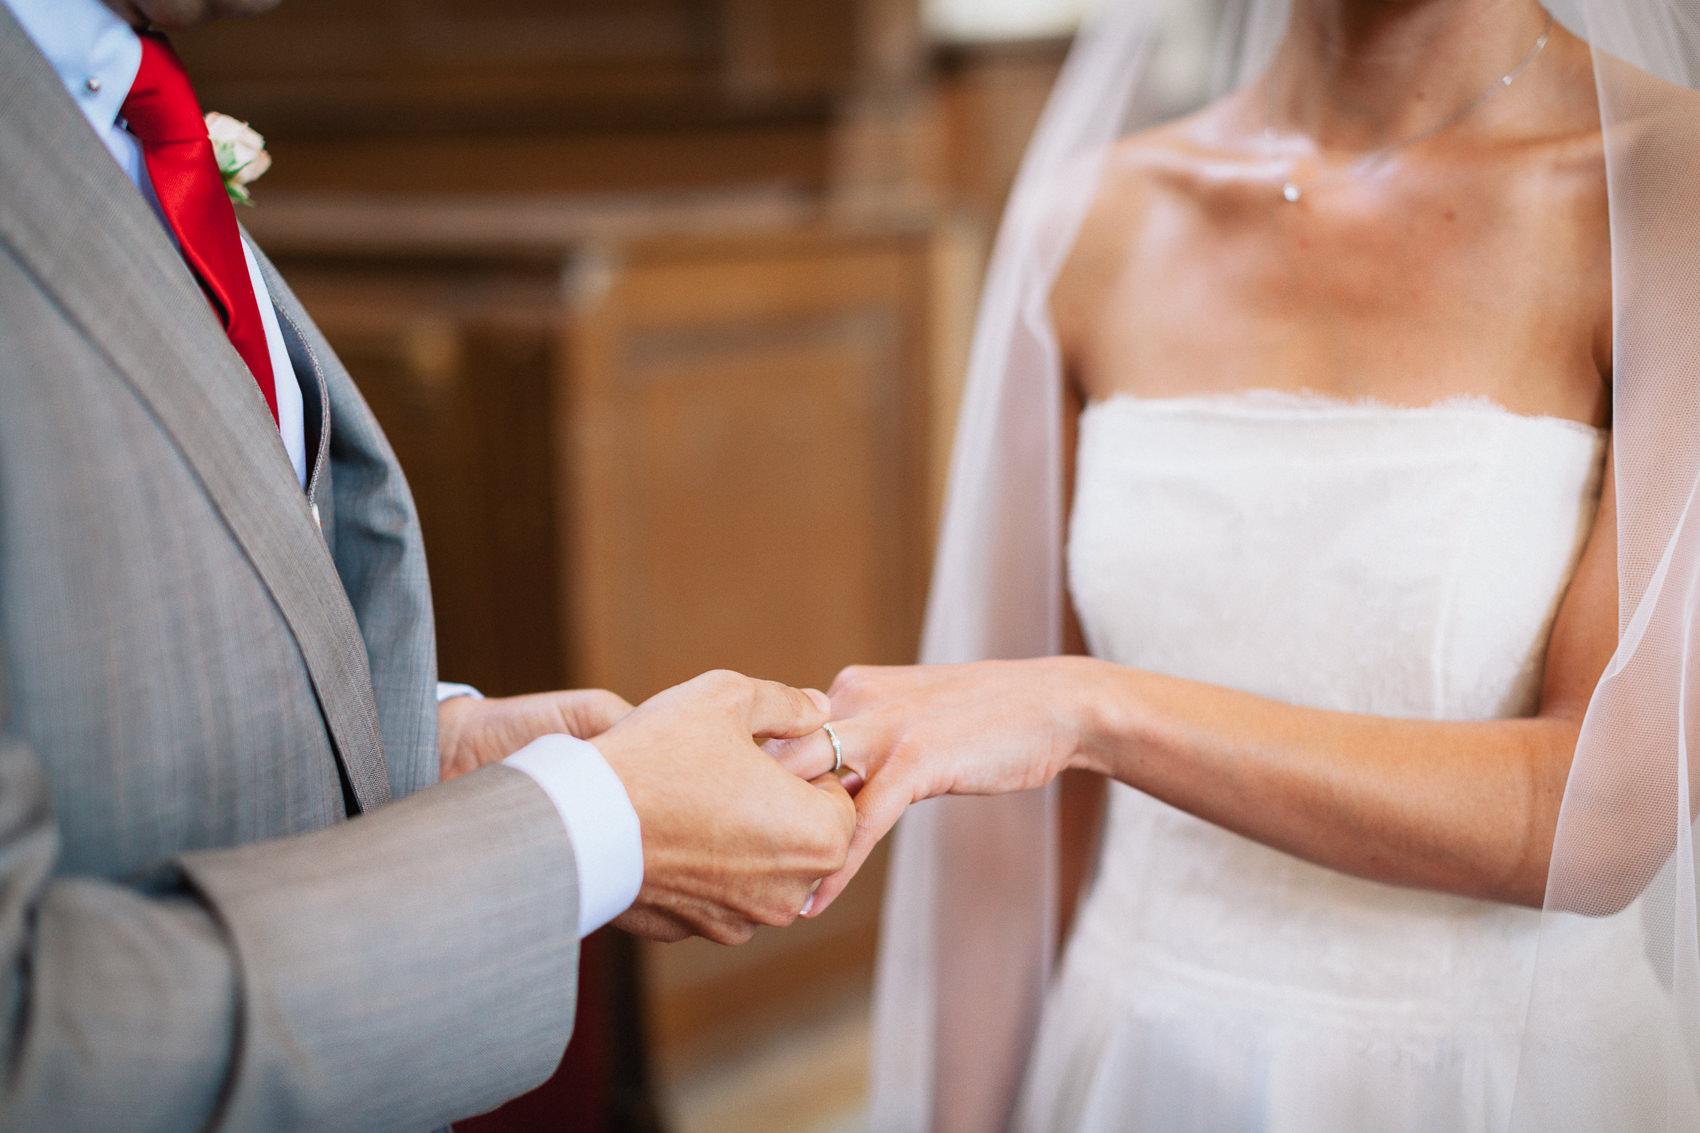 mariage-charlotte-et-joel-trendzphotography-047